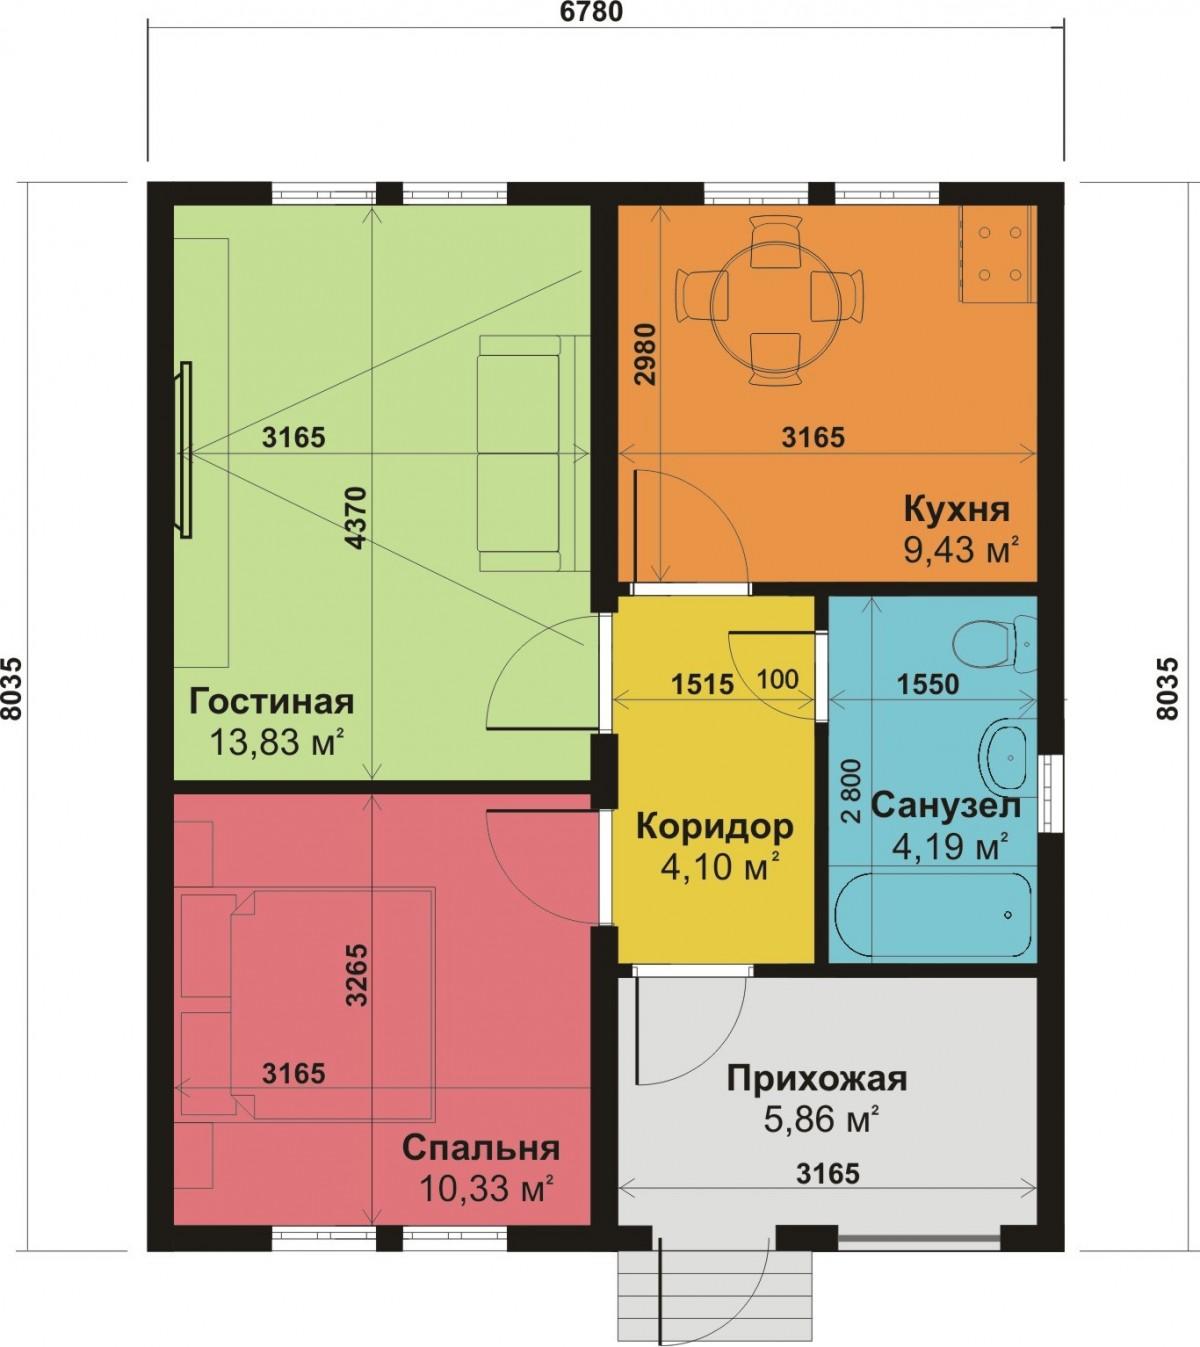 proekt-posadski-1-etag